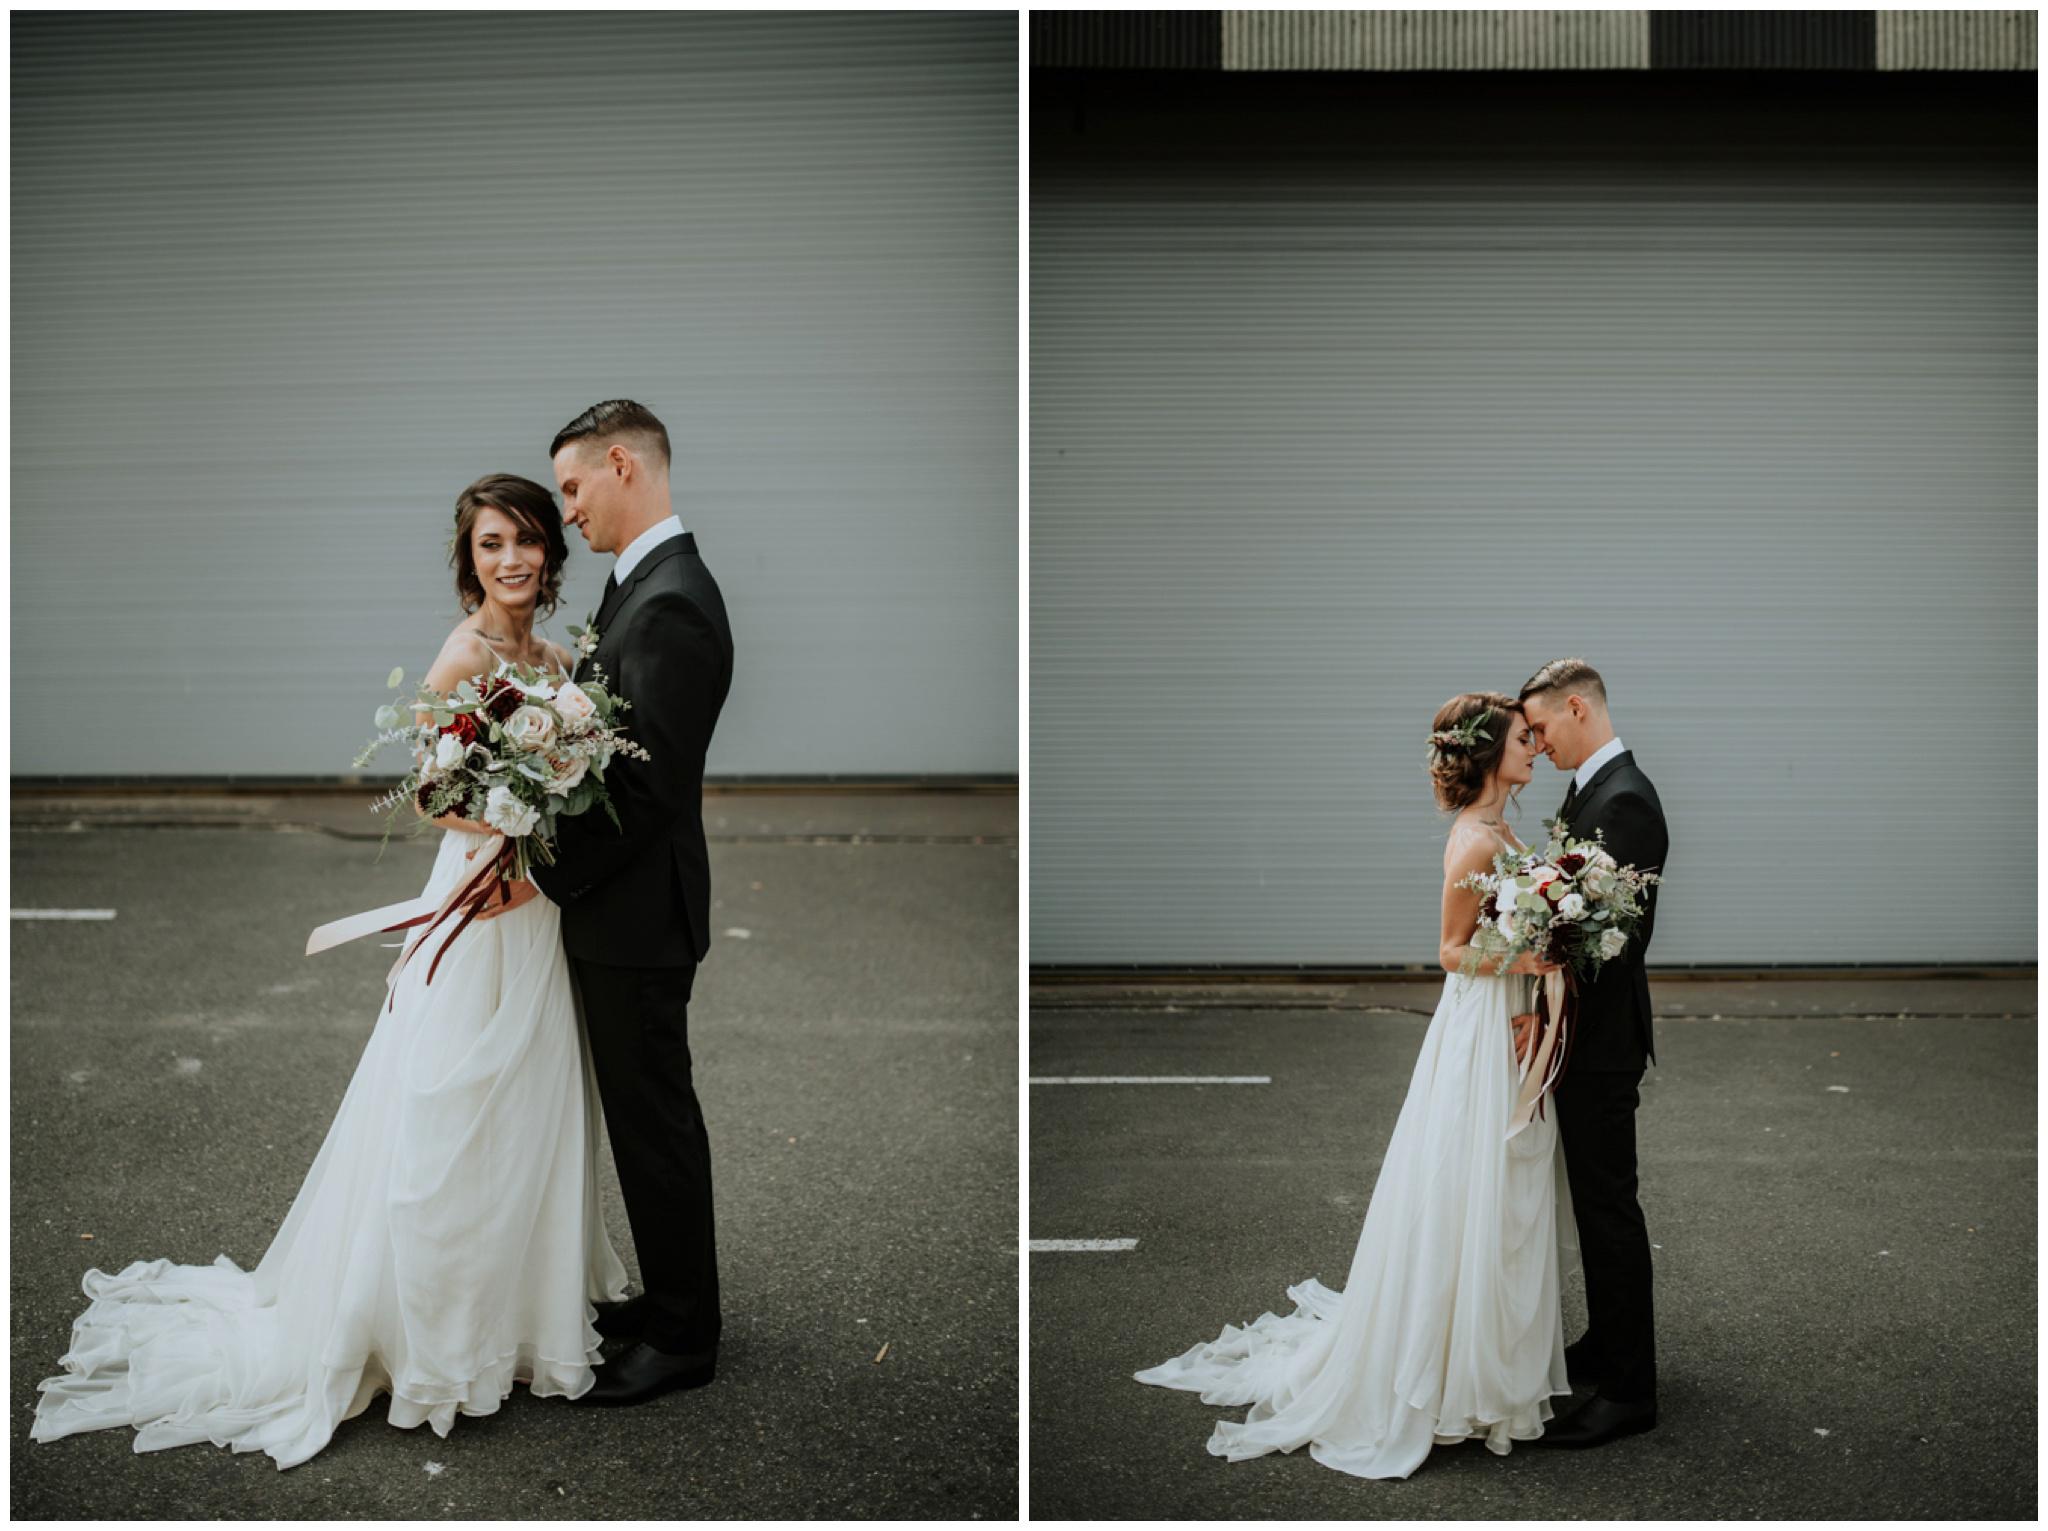 alyssa-keiran-westland-distillery-urban-seattle-wedding-photographer-caitlyn-nikula-62.jpg